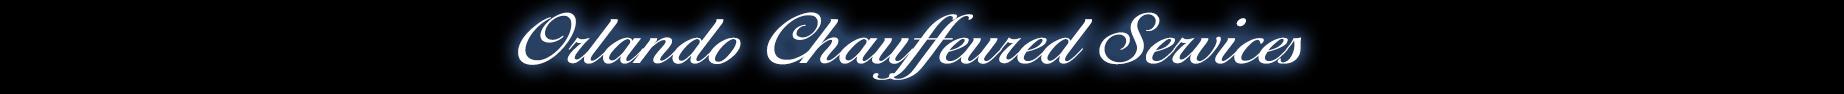 Orlando Chauffeured Services Logo